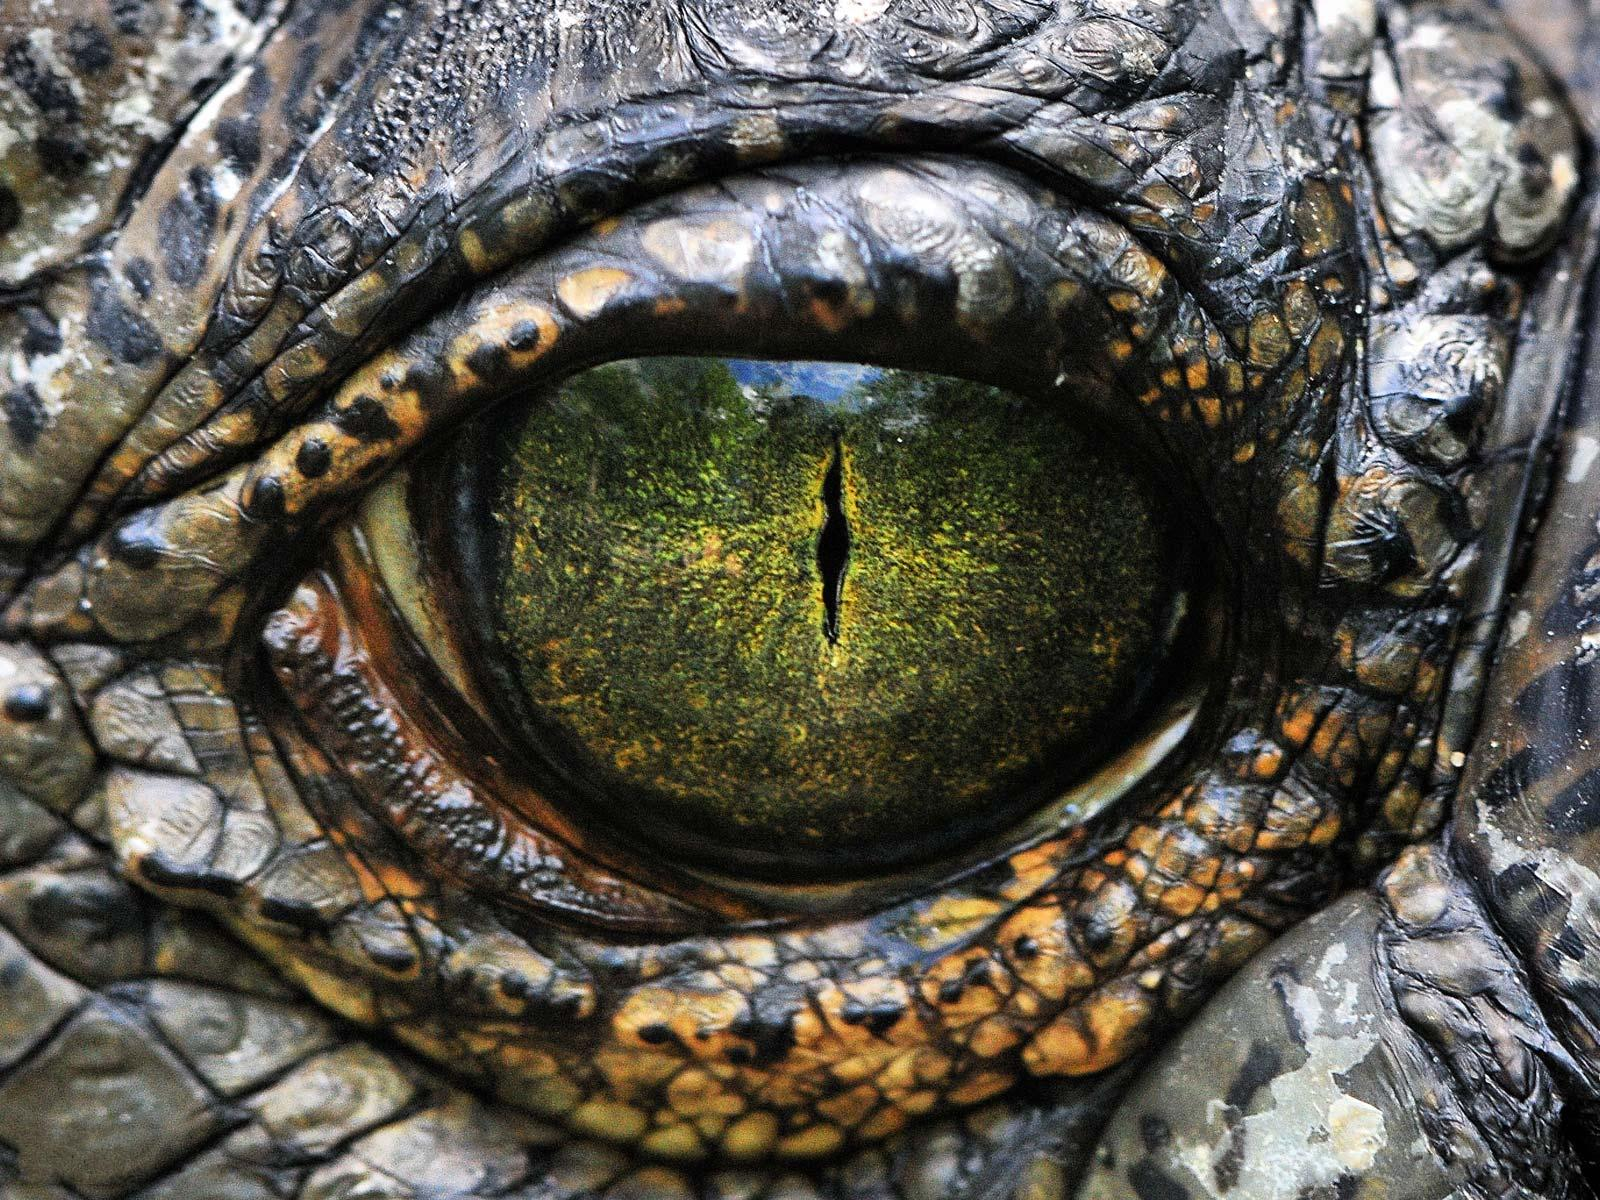 Genie Phantom Story Crocodile eyes 1600x1200